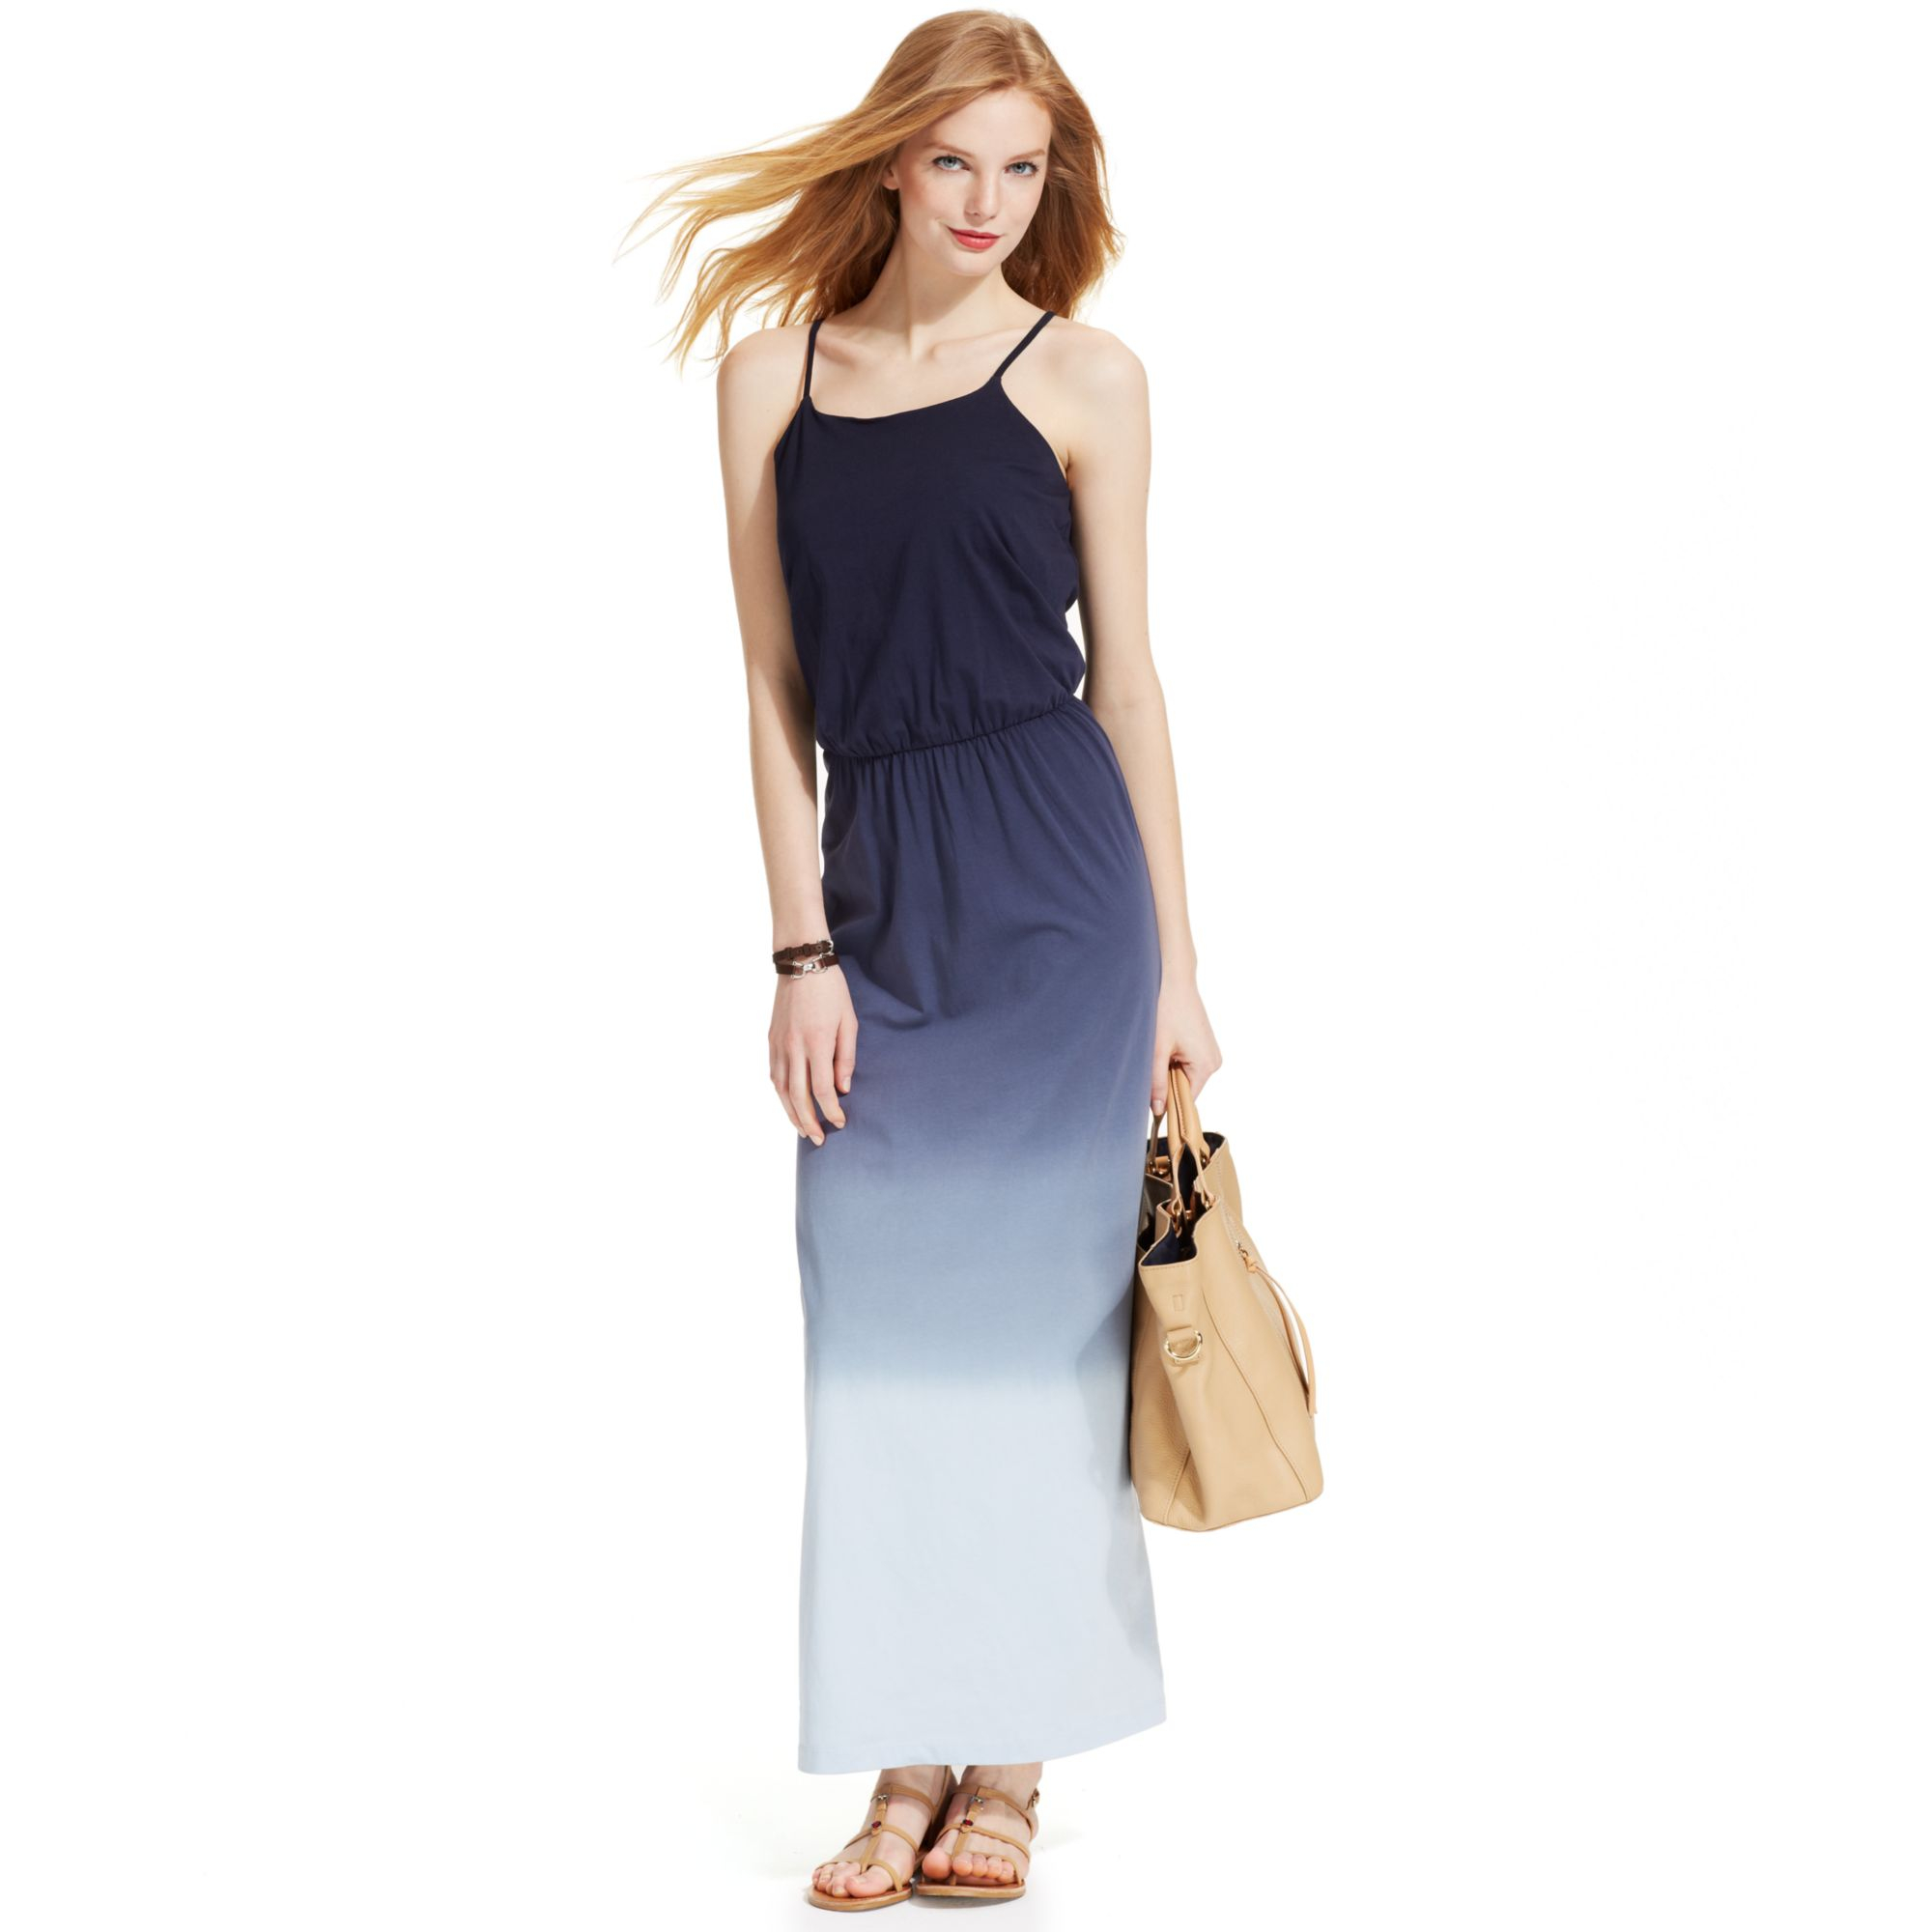 b3cf2a87672 Tommy Hilfiger Spaghettistrap Ombre Maxi Dress in Blue - Lyst